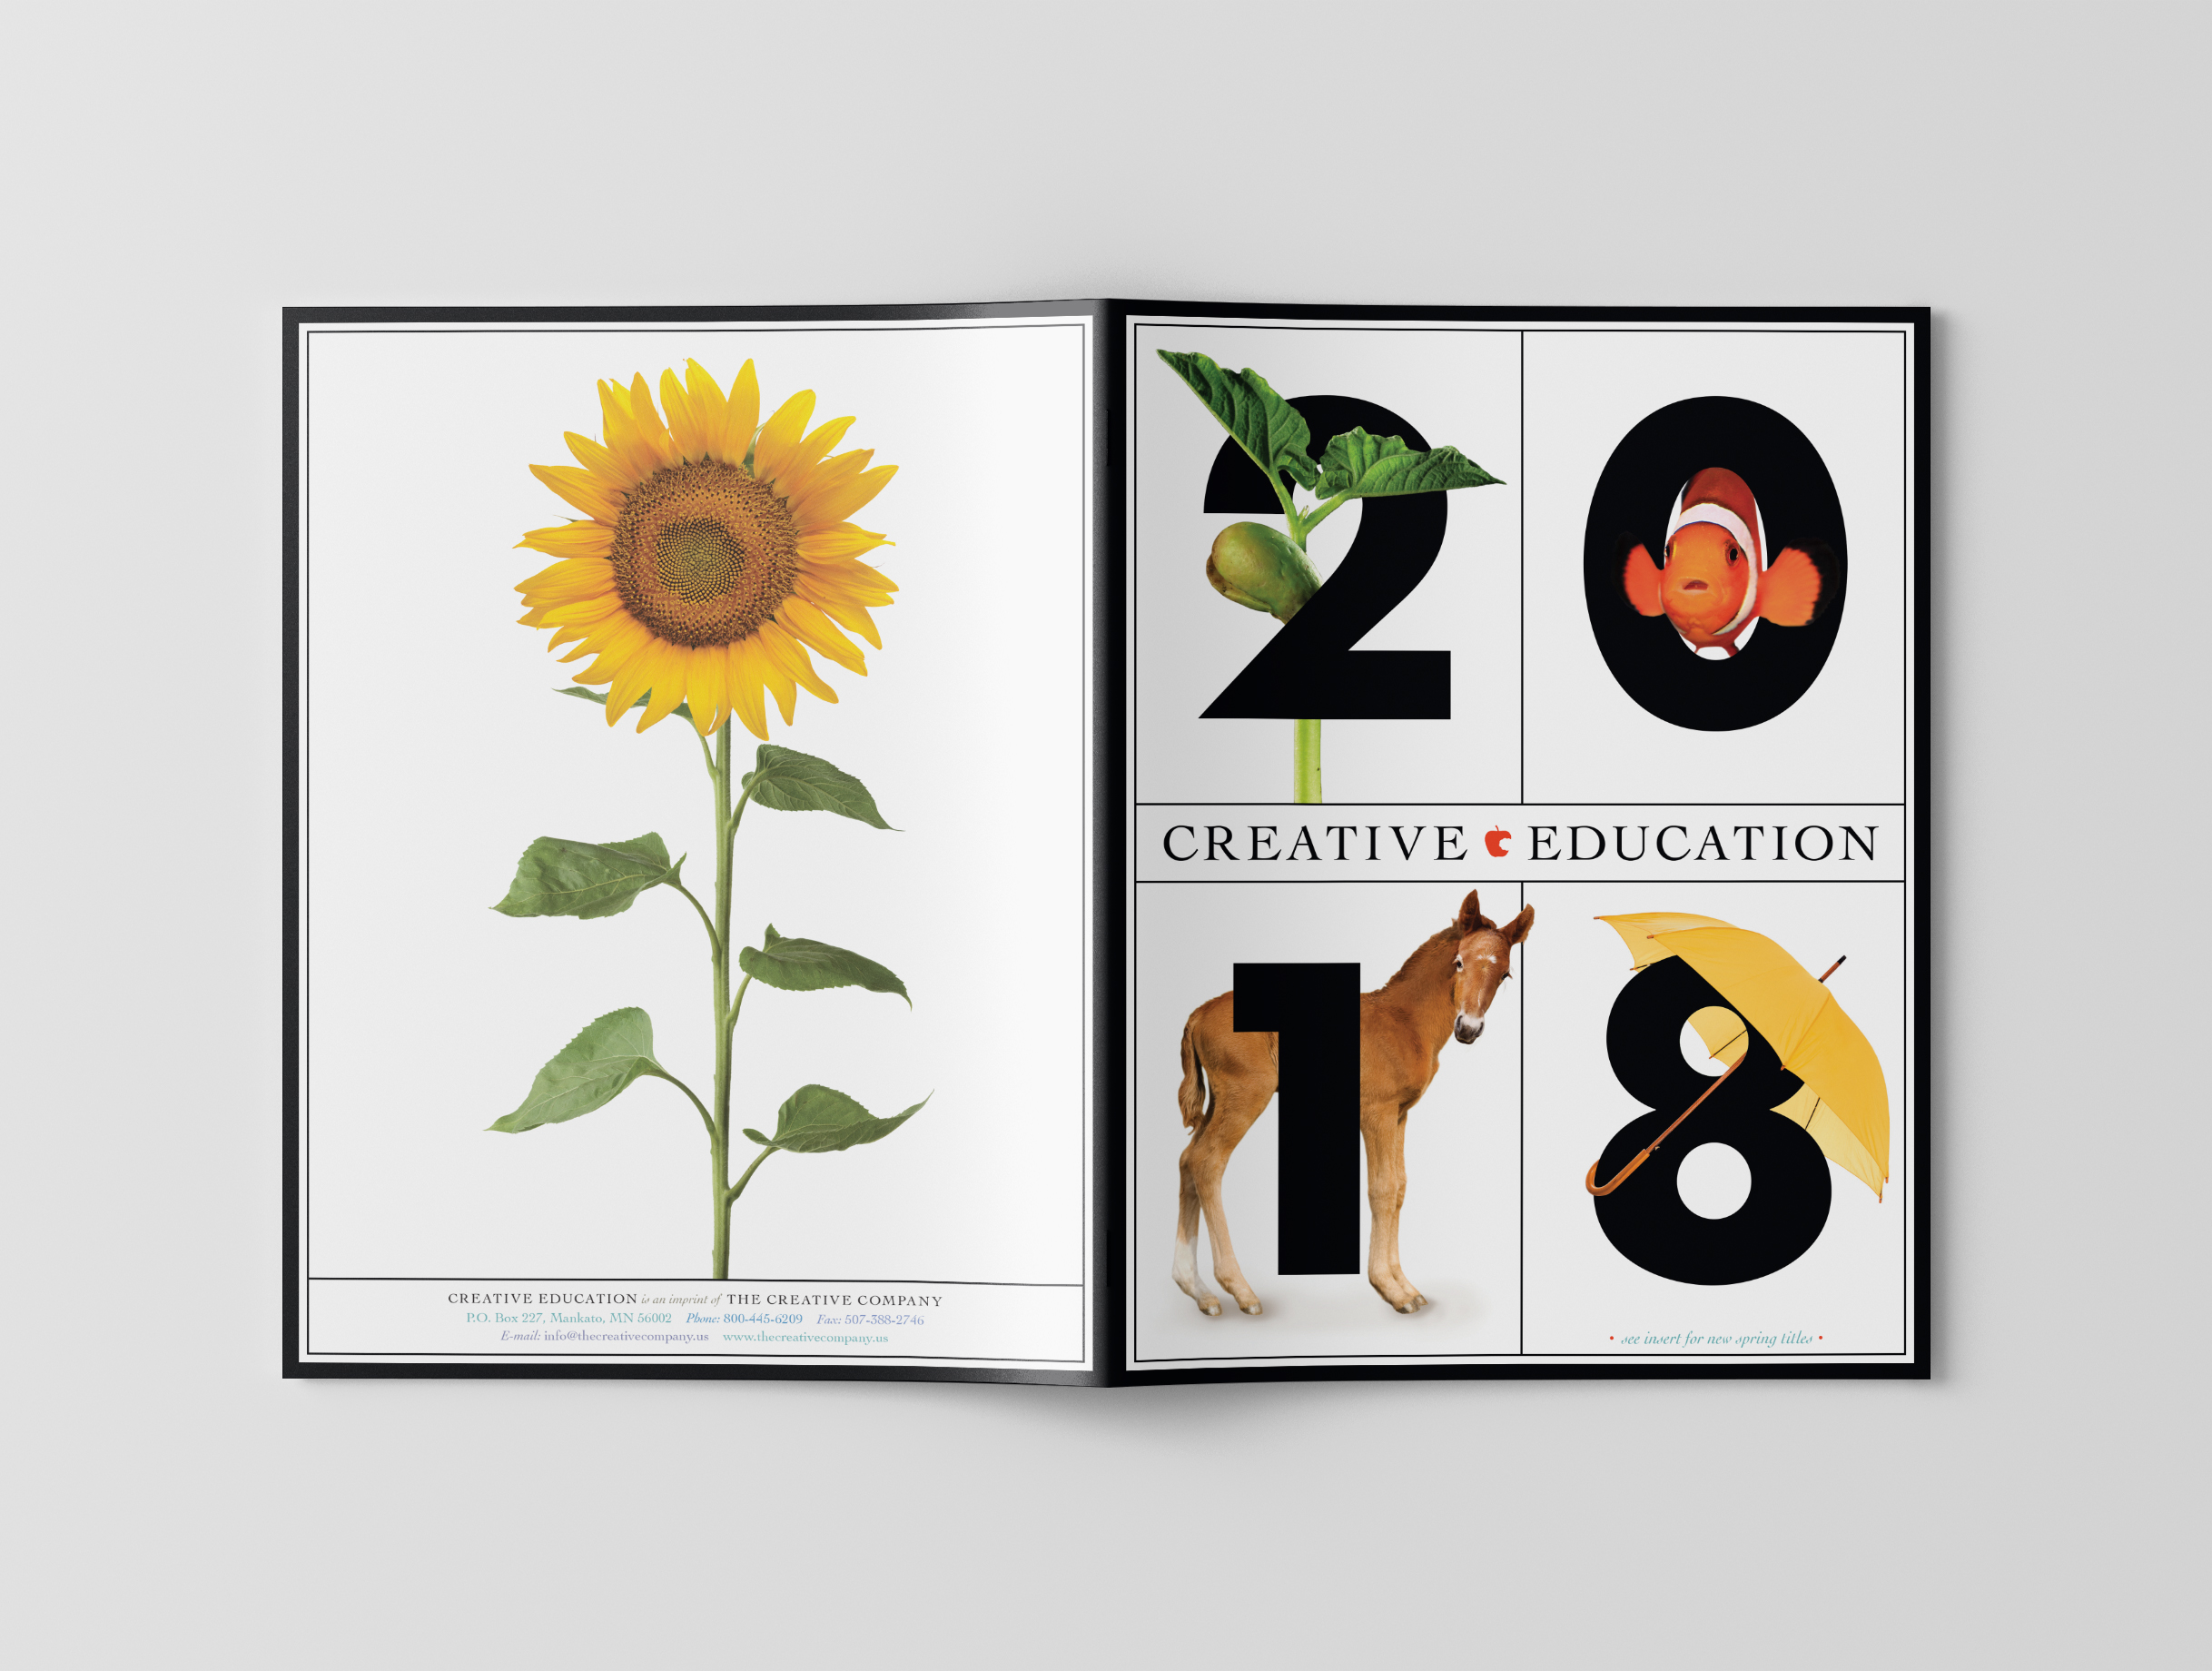 CVanderbeek_Creative Education Catalog 2.jpg